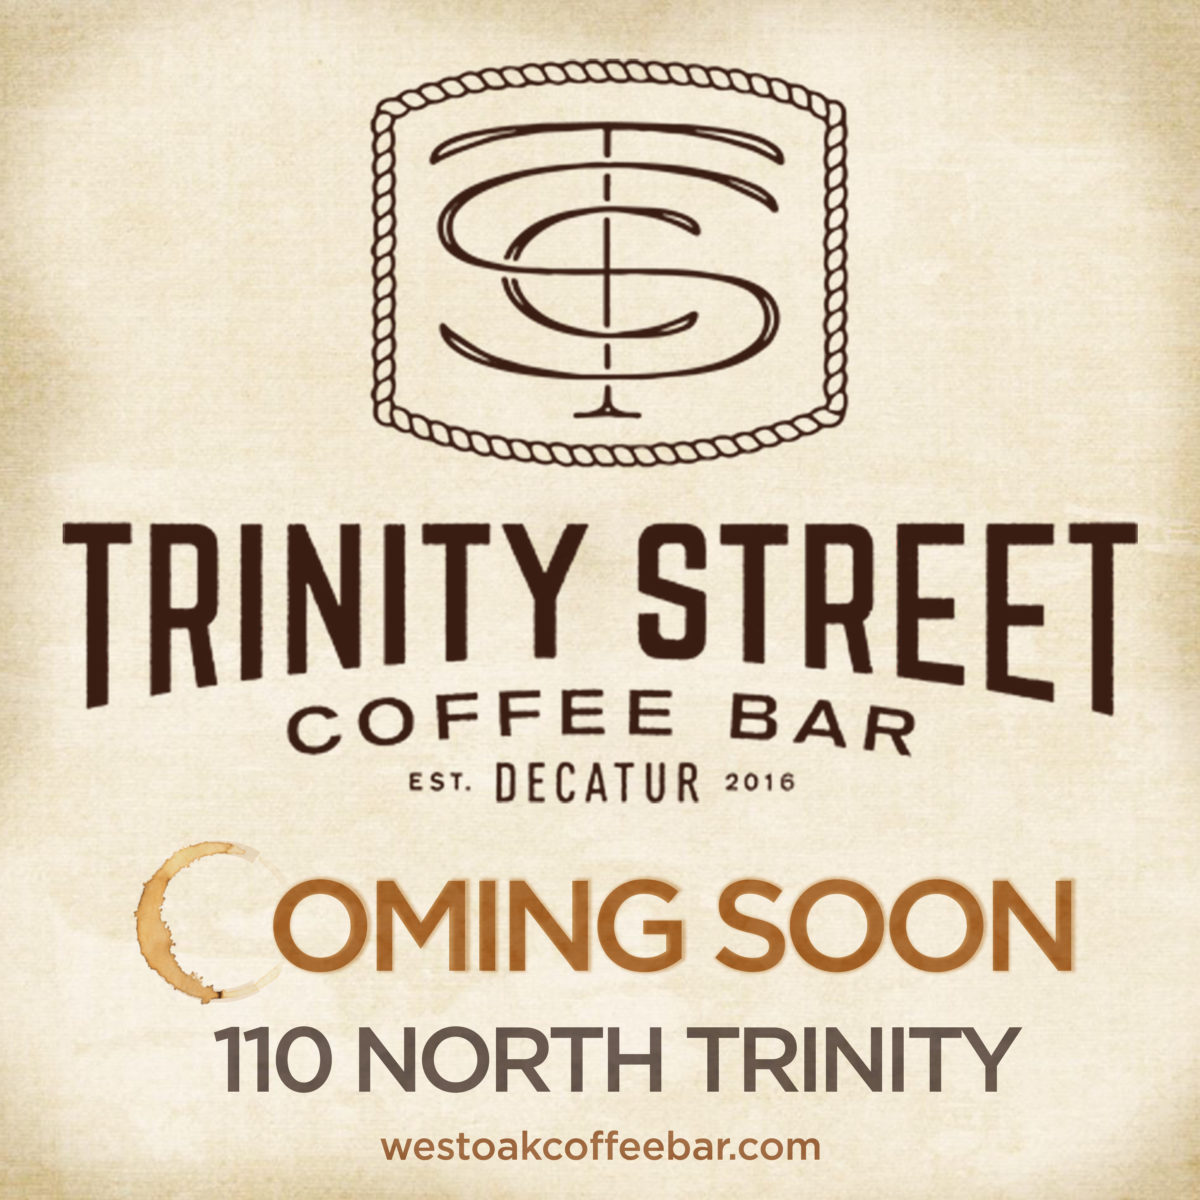 Trinity Street Coffee Bar